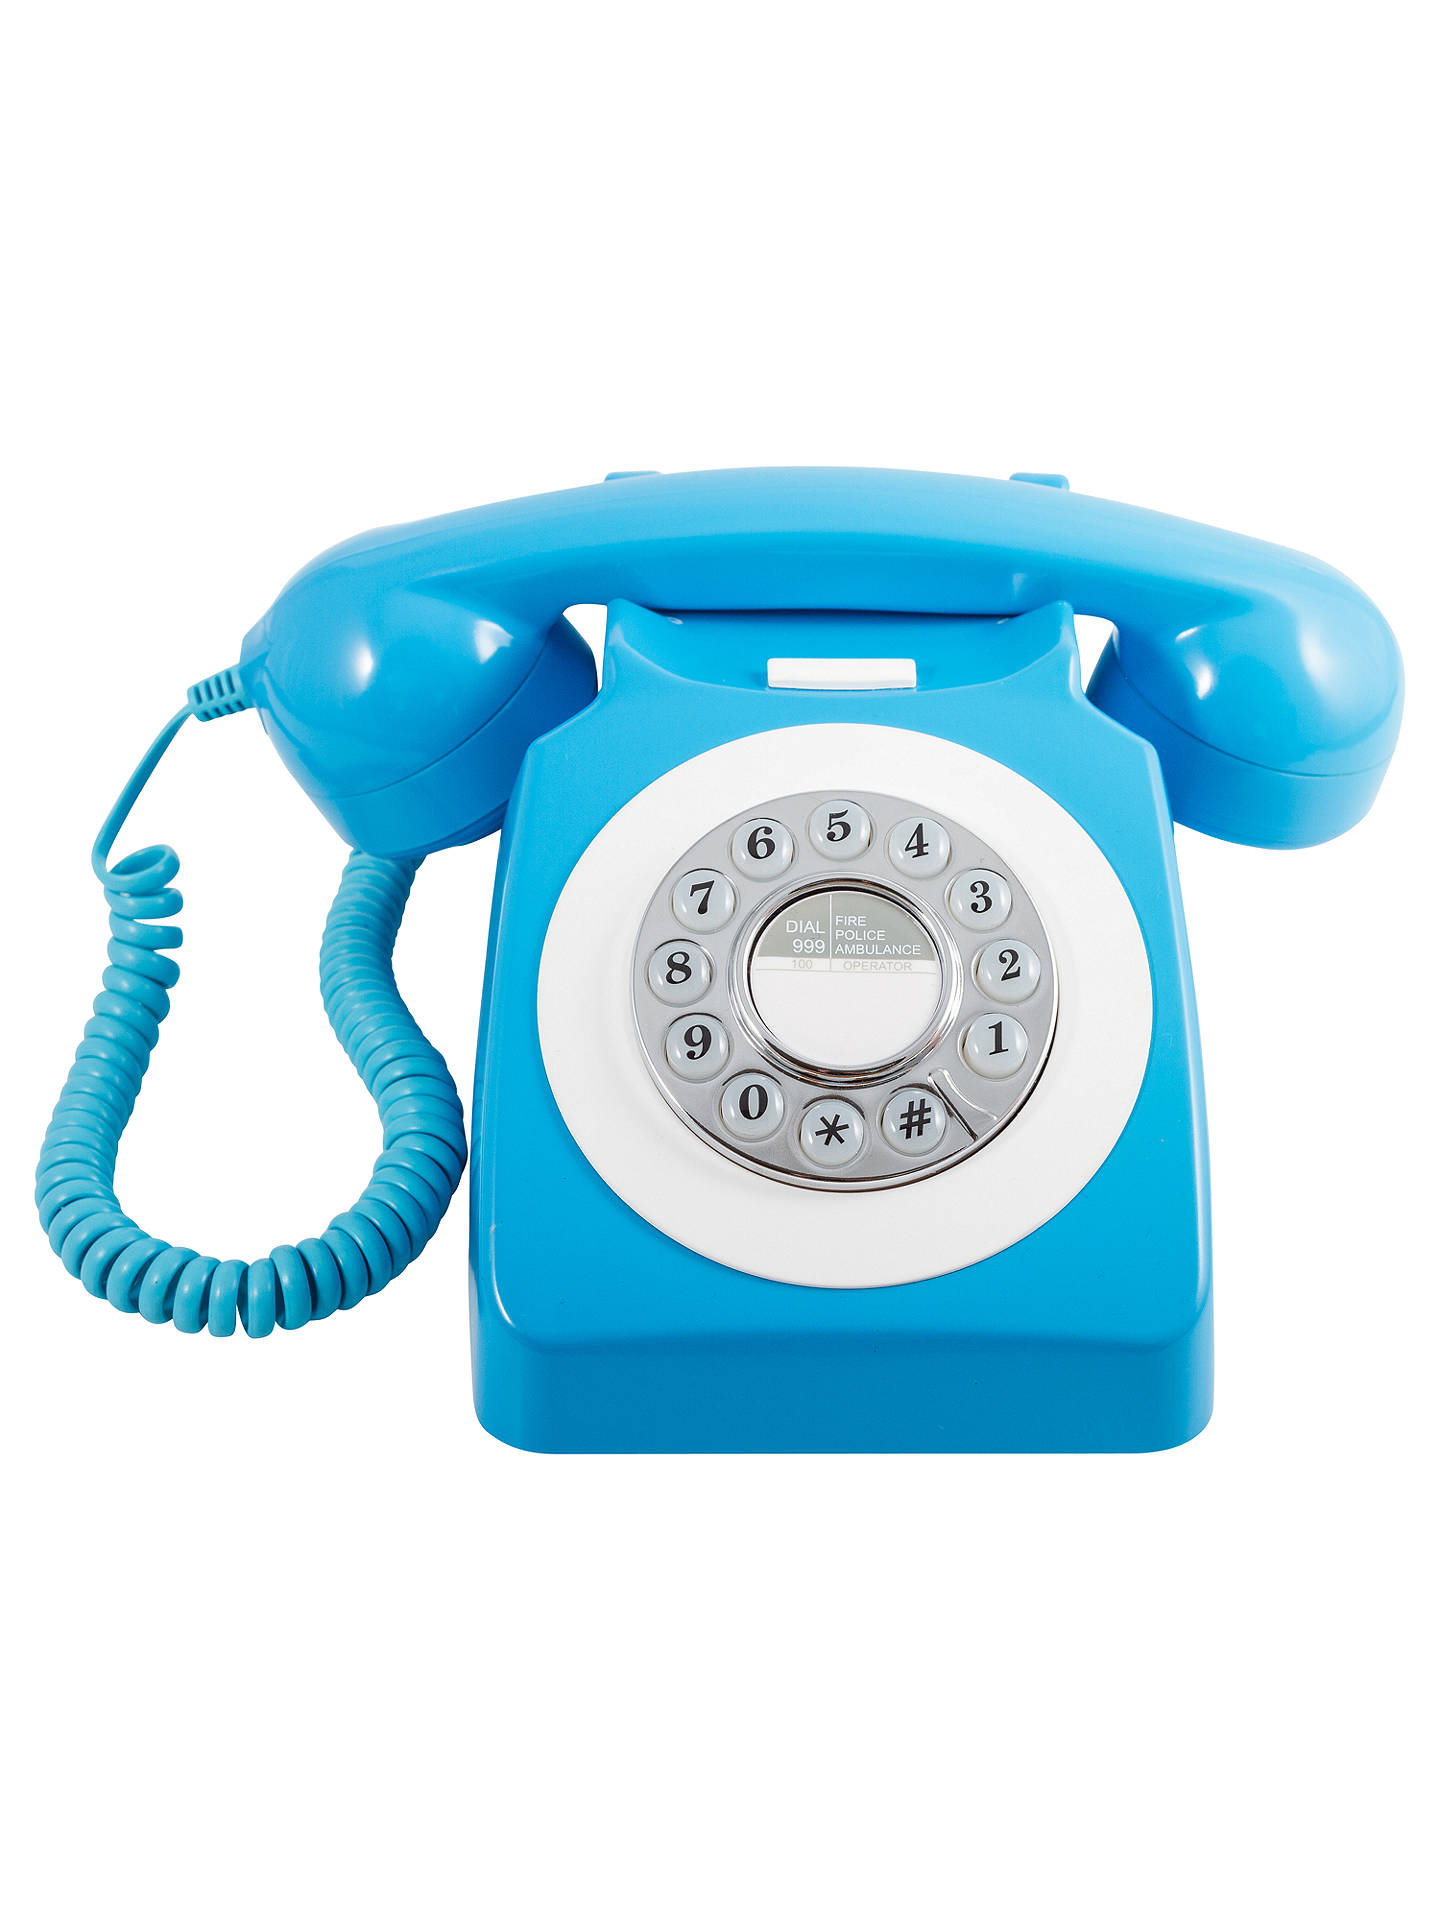 GPO 746 Retro Rotary Phone, Neon Blue at John Lewis & Partners